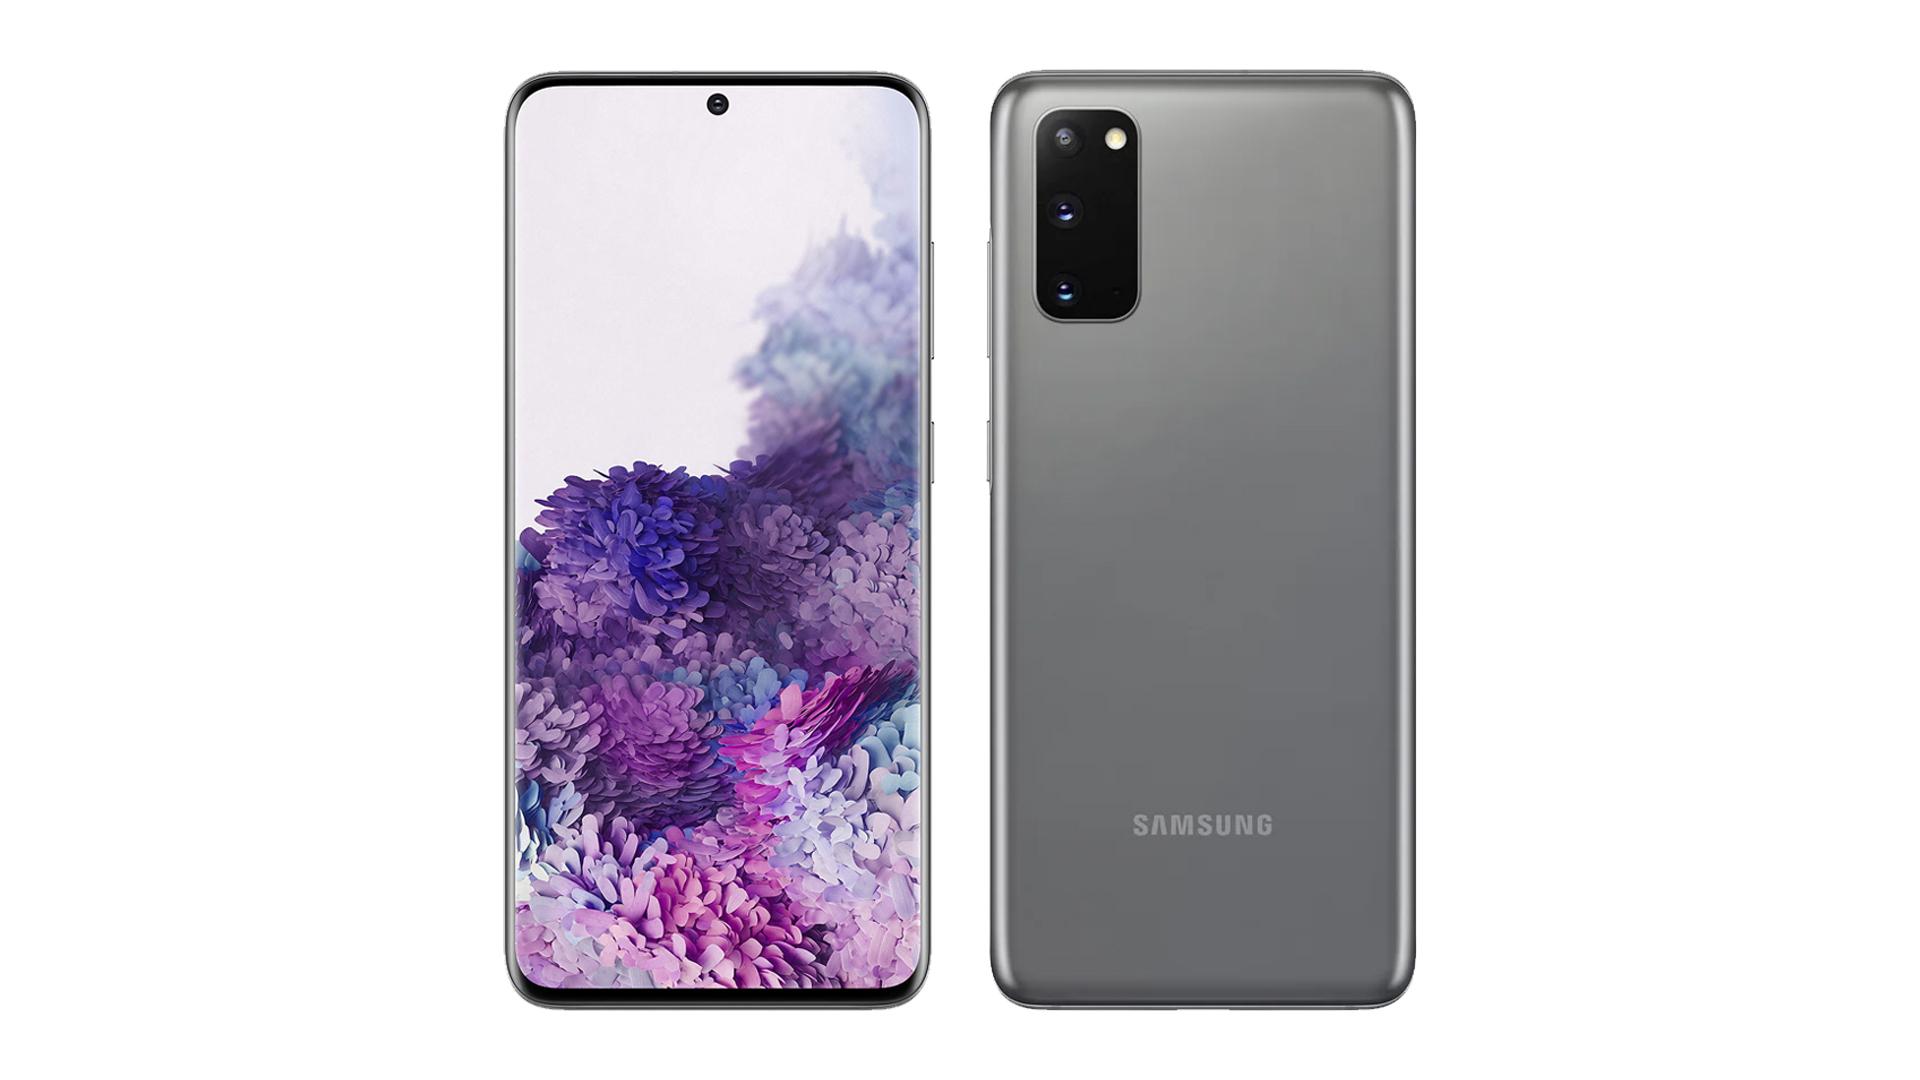 Soyez 5G ready avec le Samsung Galaxy S20 à seulement 730 euros